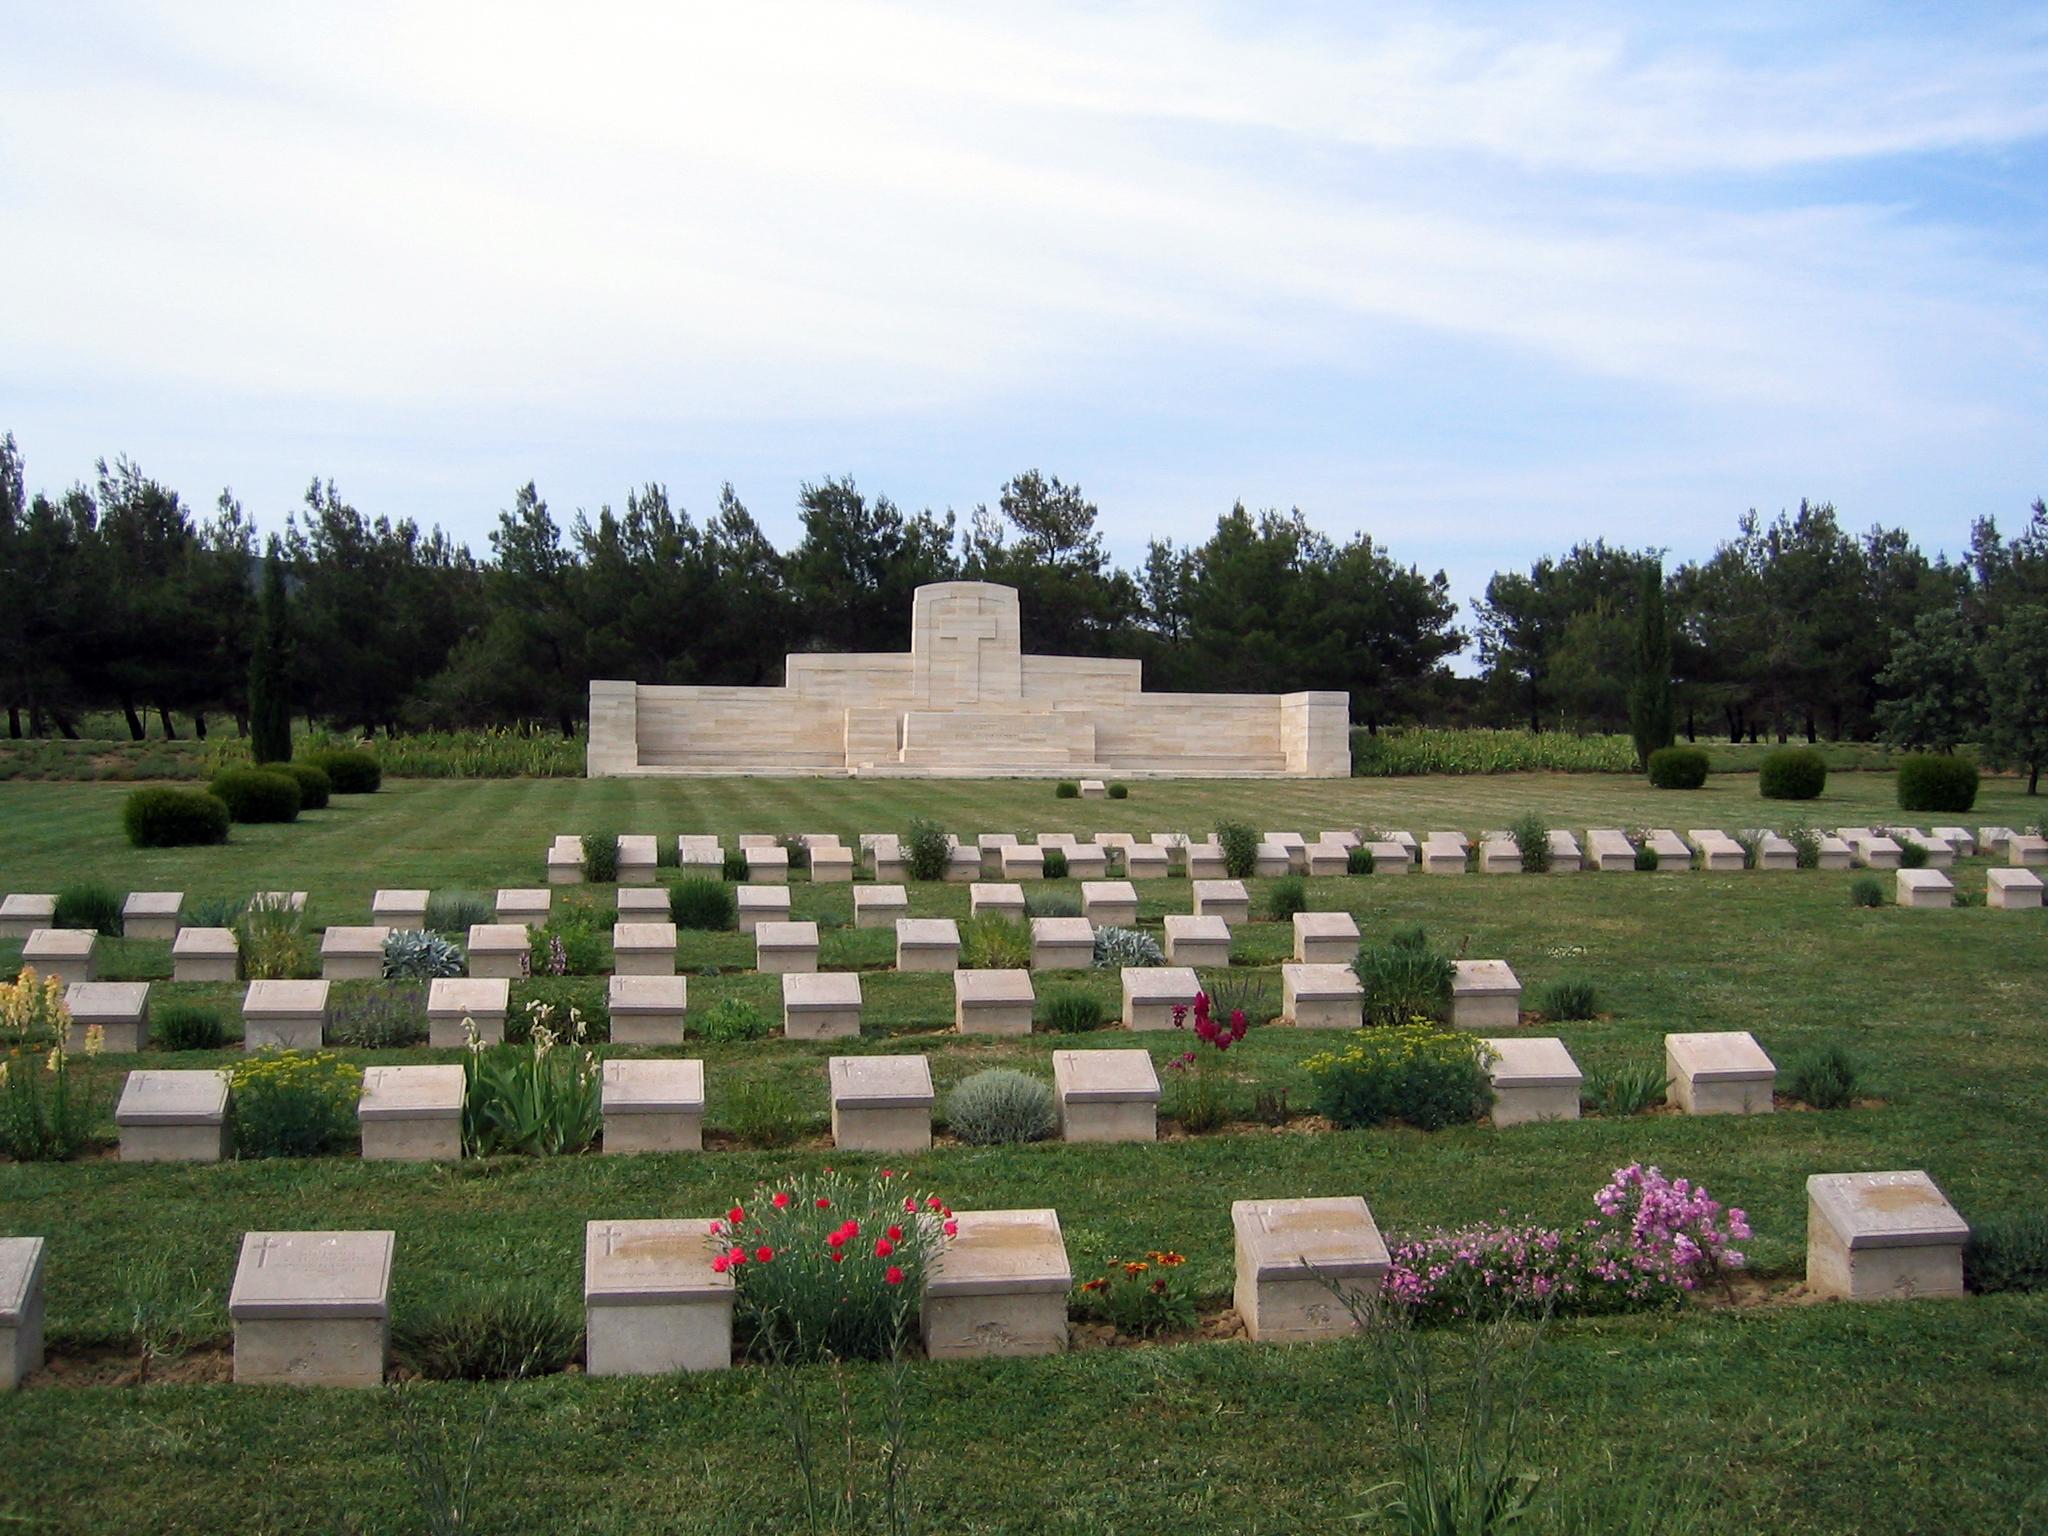 File:Azmak Cemetery, Gallipoli Peninsula.JPG - Wikipedia